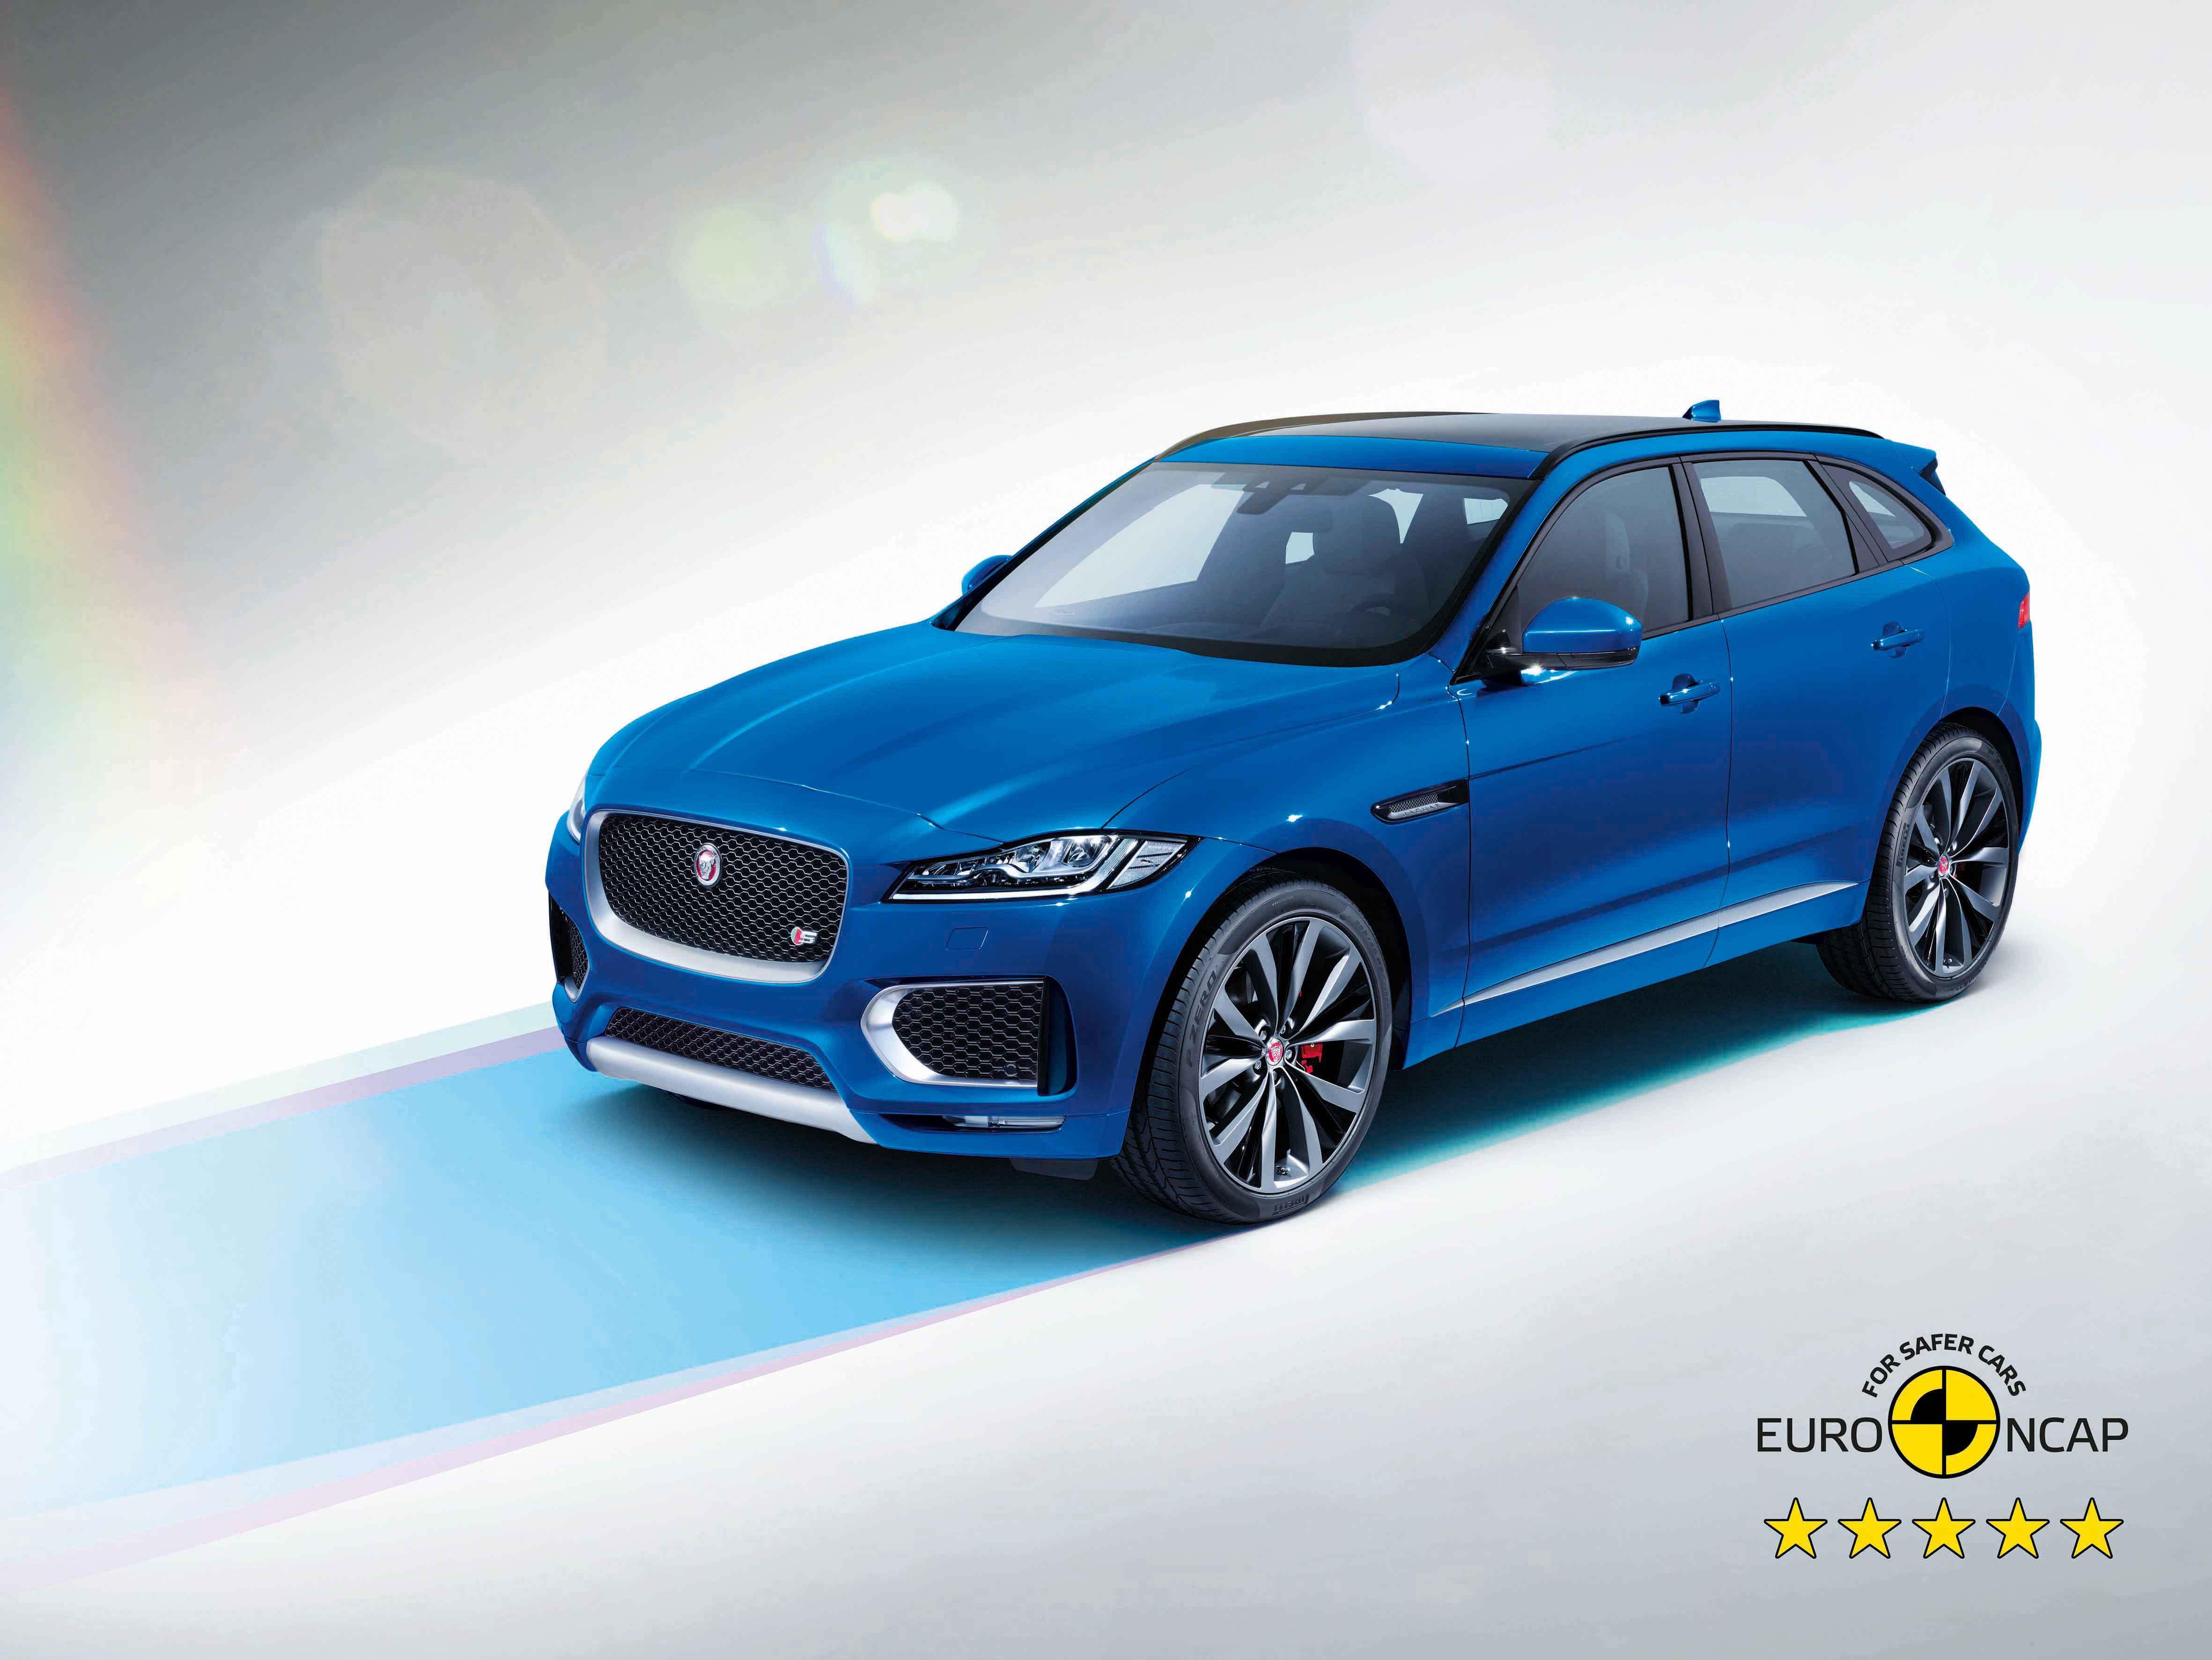 Jaguar F-Pace consegue 5 estrelas nos testes EURO NCAP